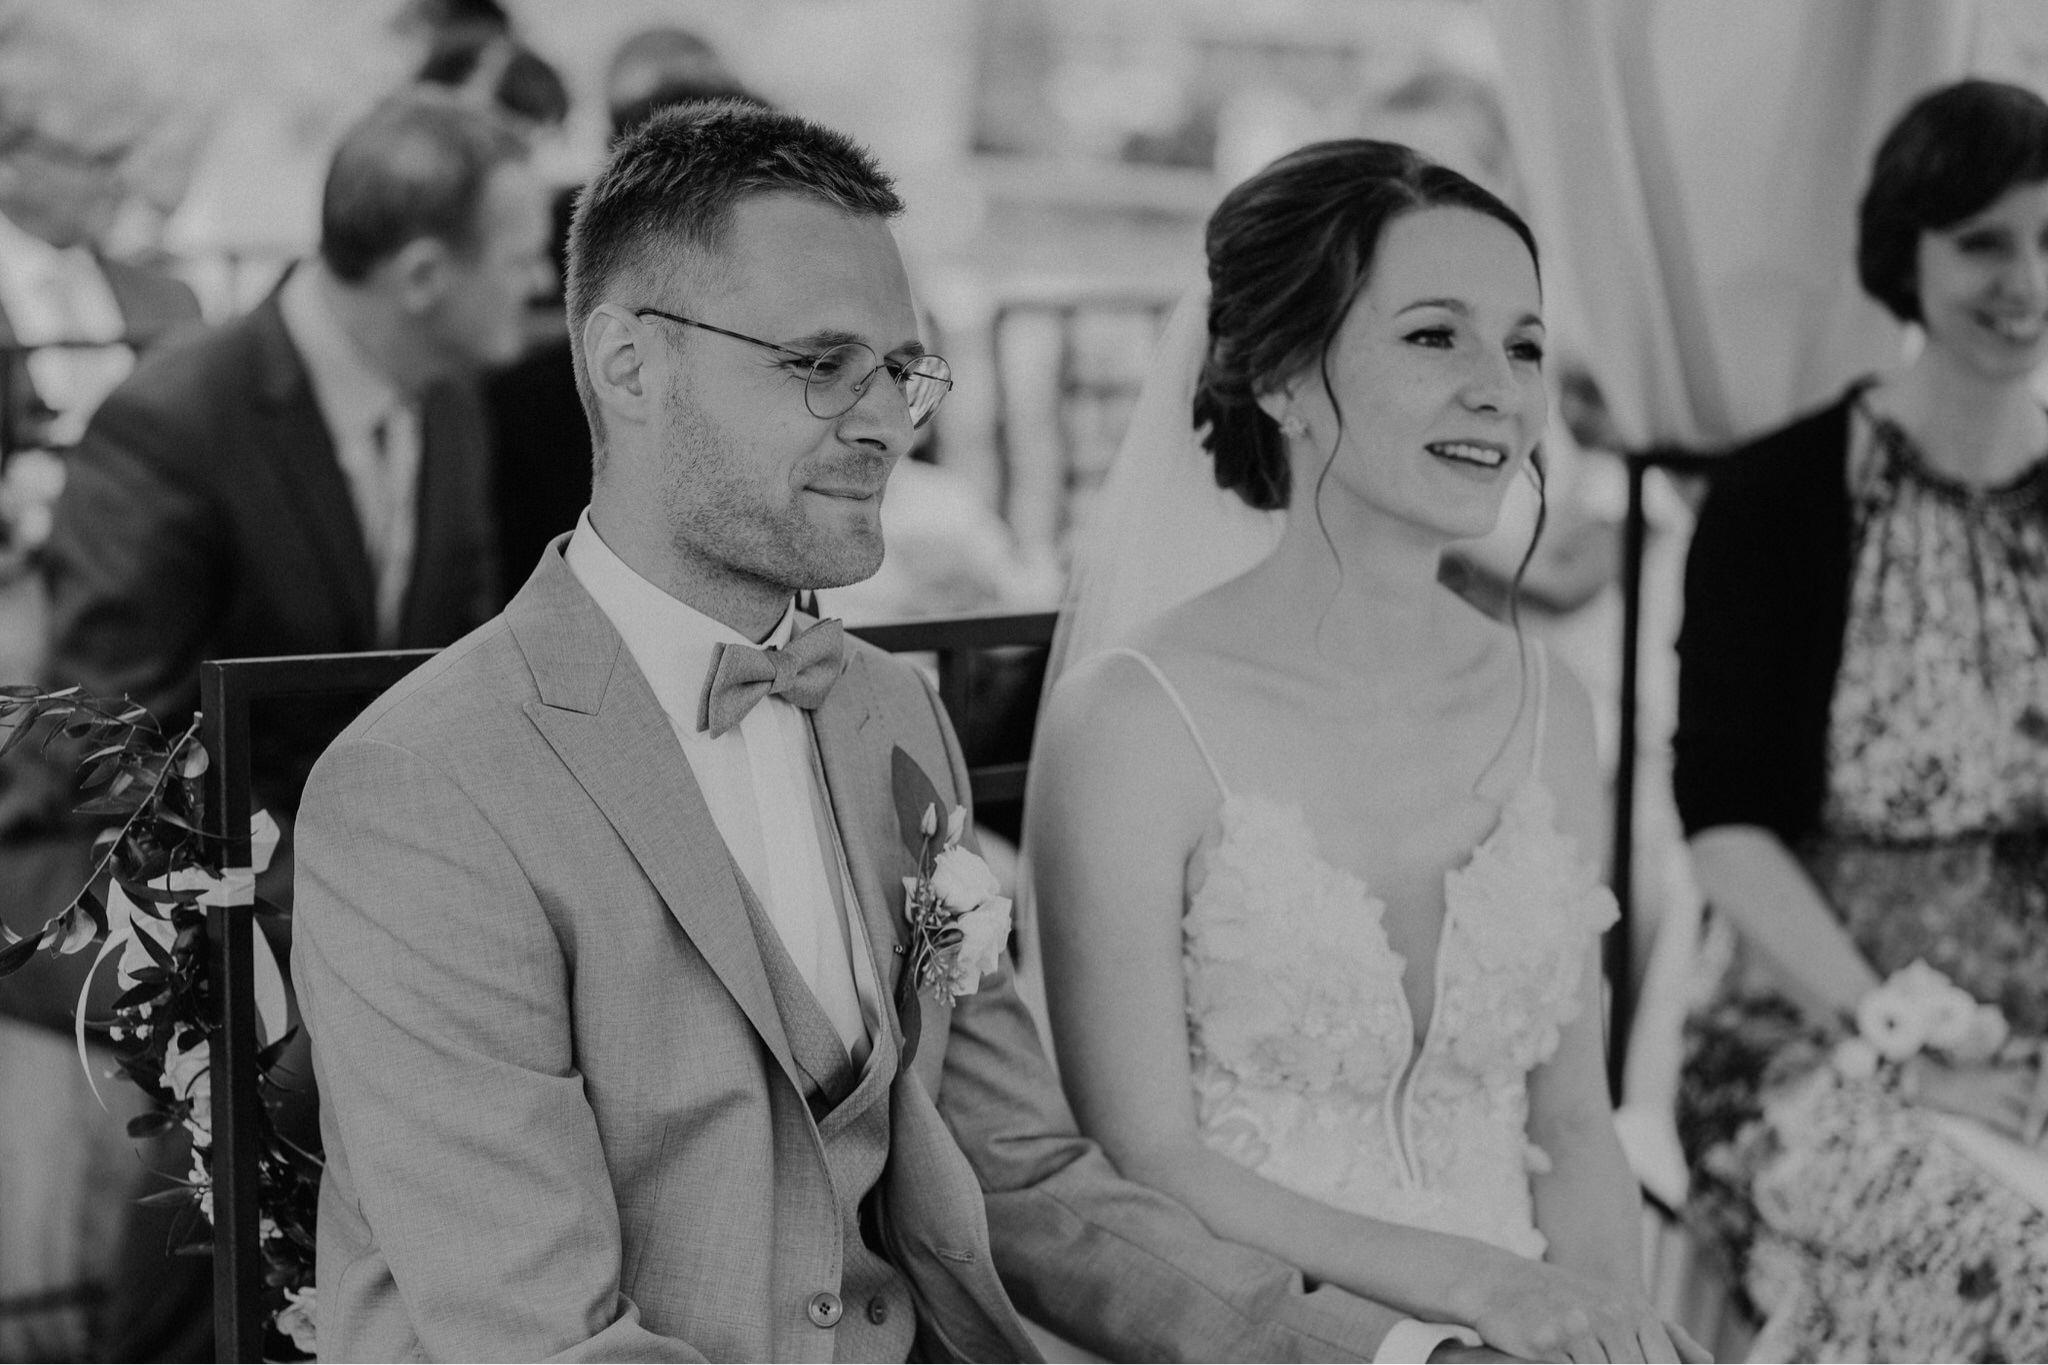 37 la 03 zeremonie 1049 weddinphotographer Hochzeitsfotograf newzealand hamilton Weddingphotography Stuttgart